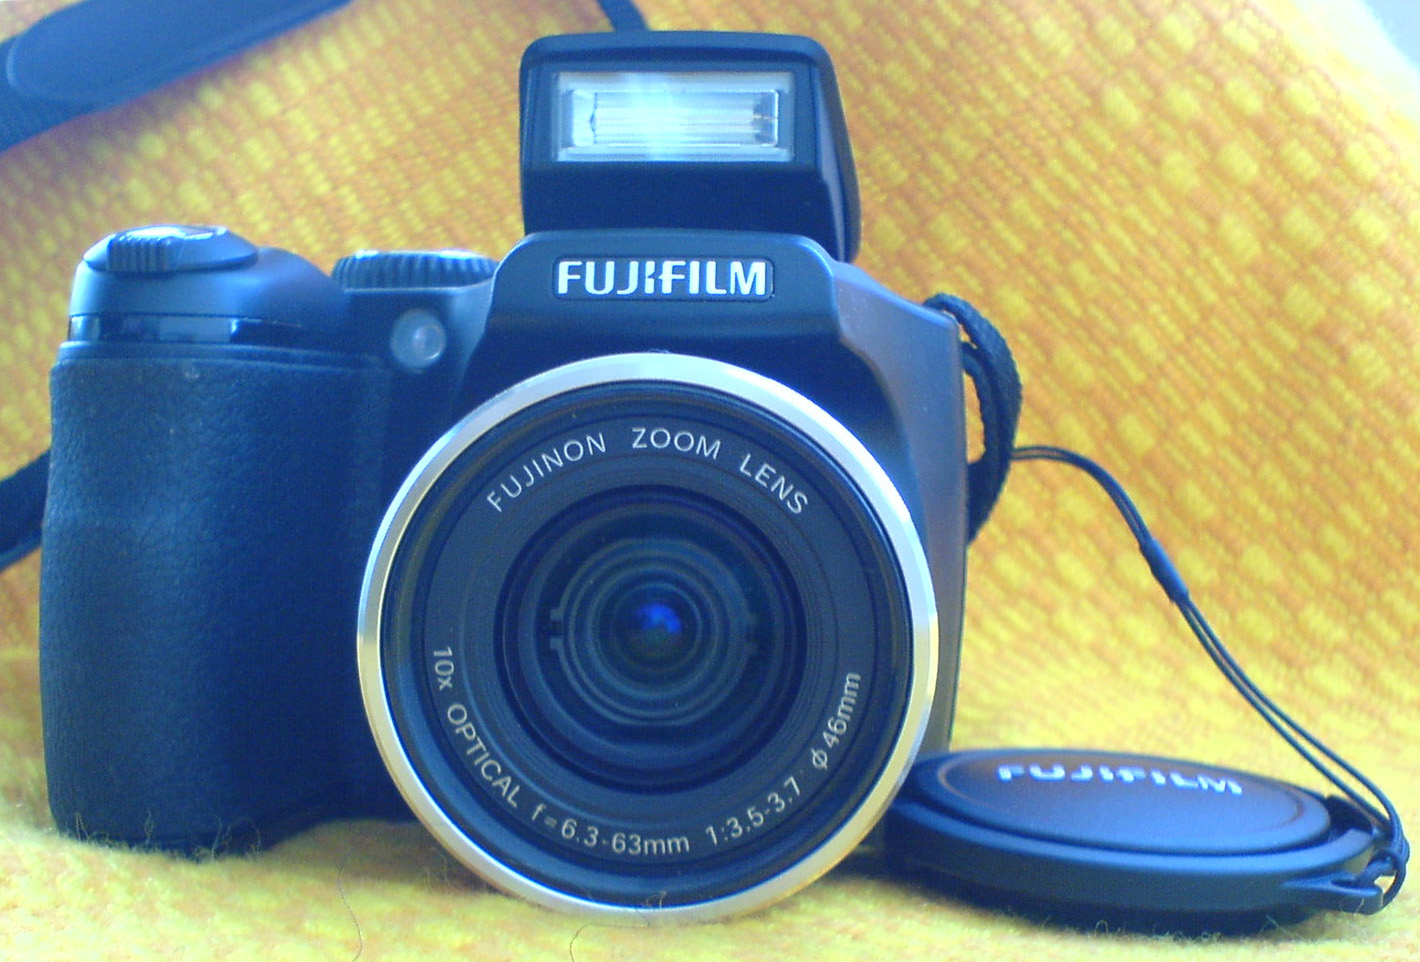 file fujifilm finepix s5700 digital camera black lens jpg rh commons wikimedia org Fujifilm S100FS Fujifilm S100FS